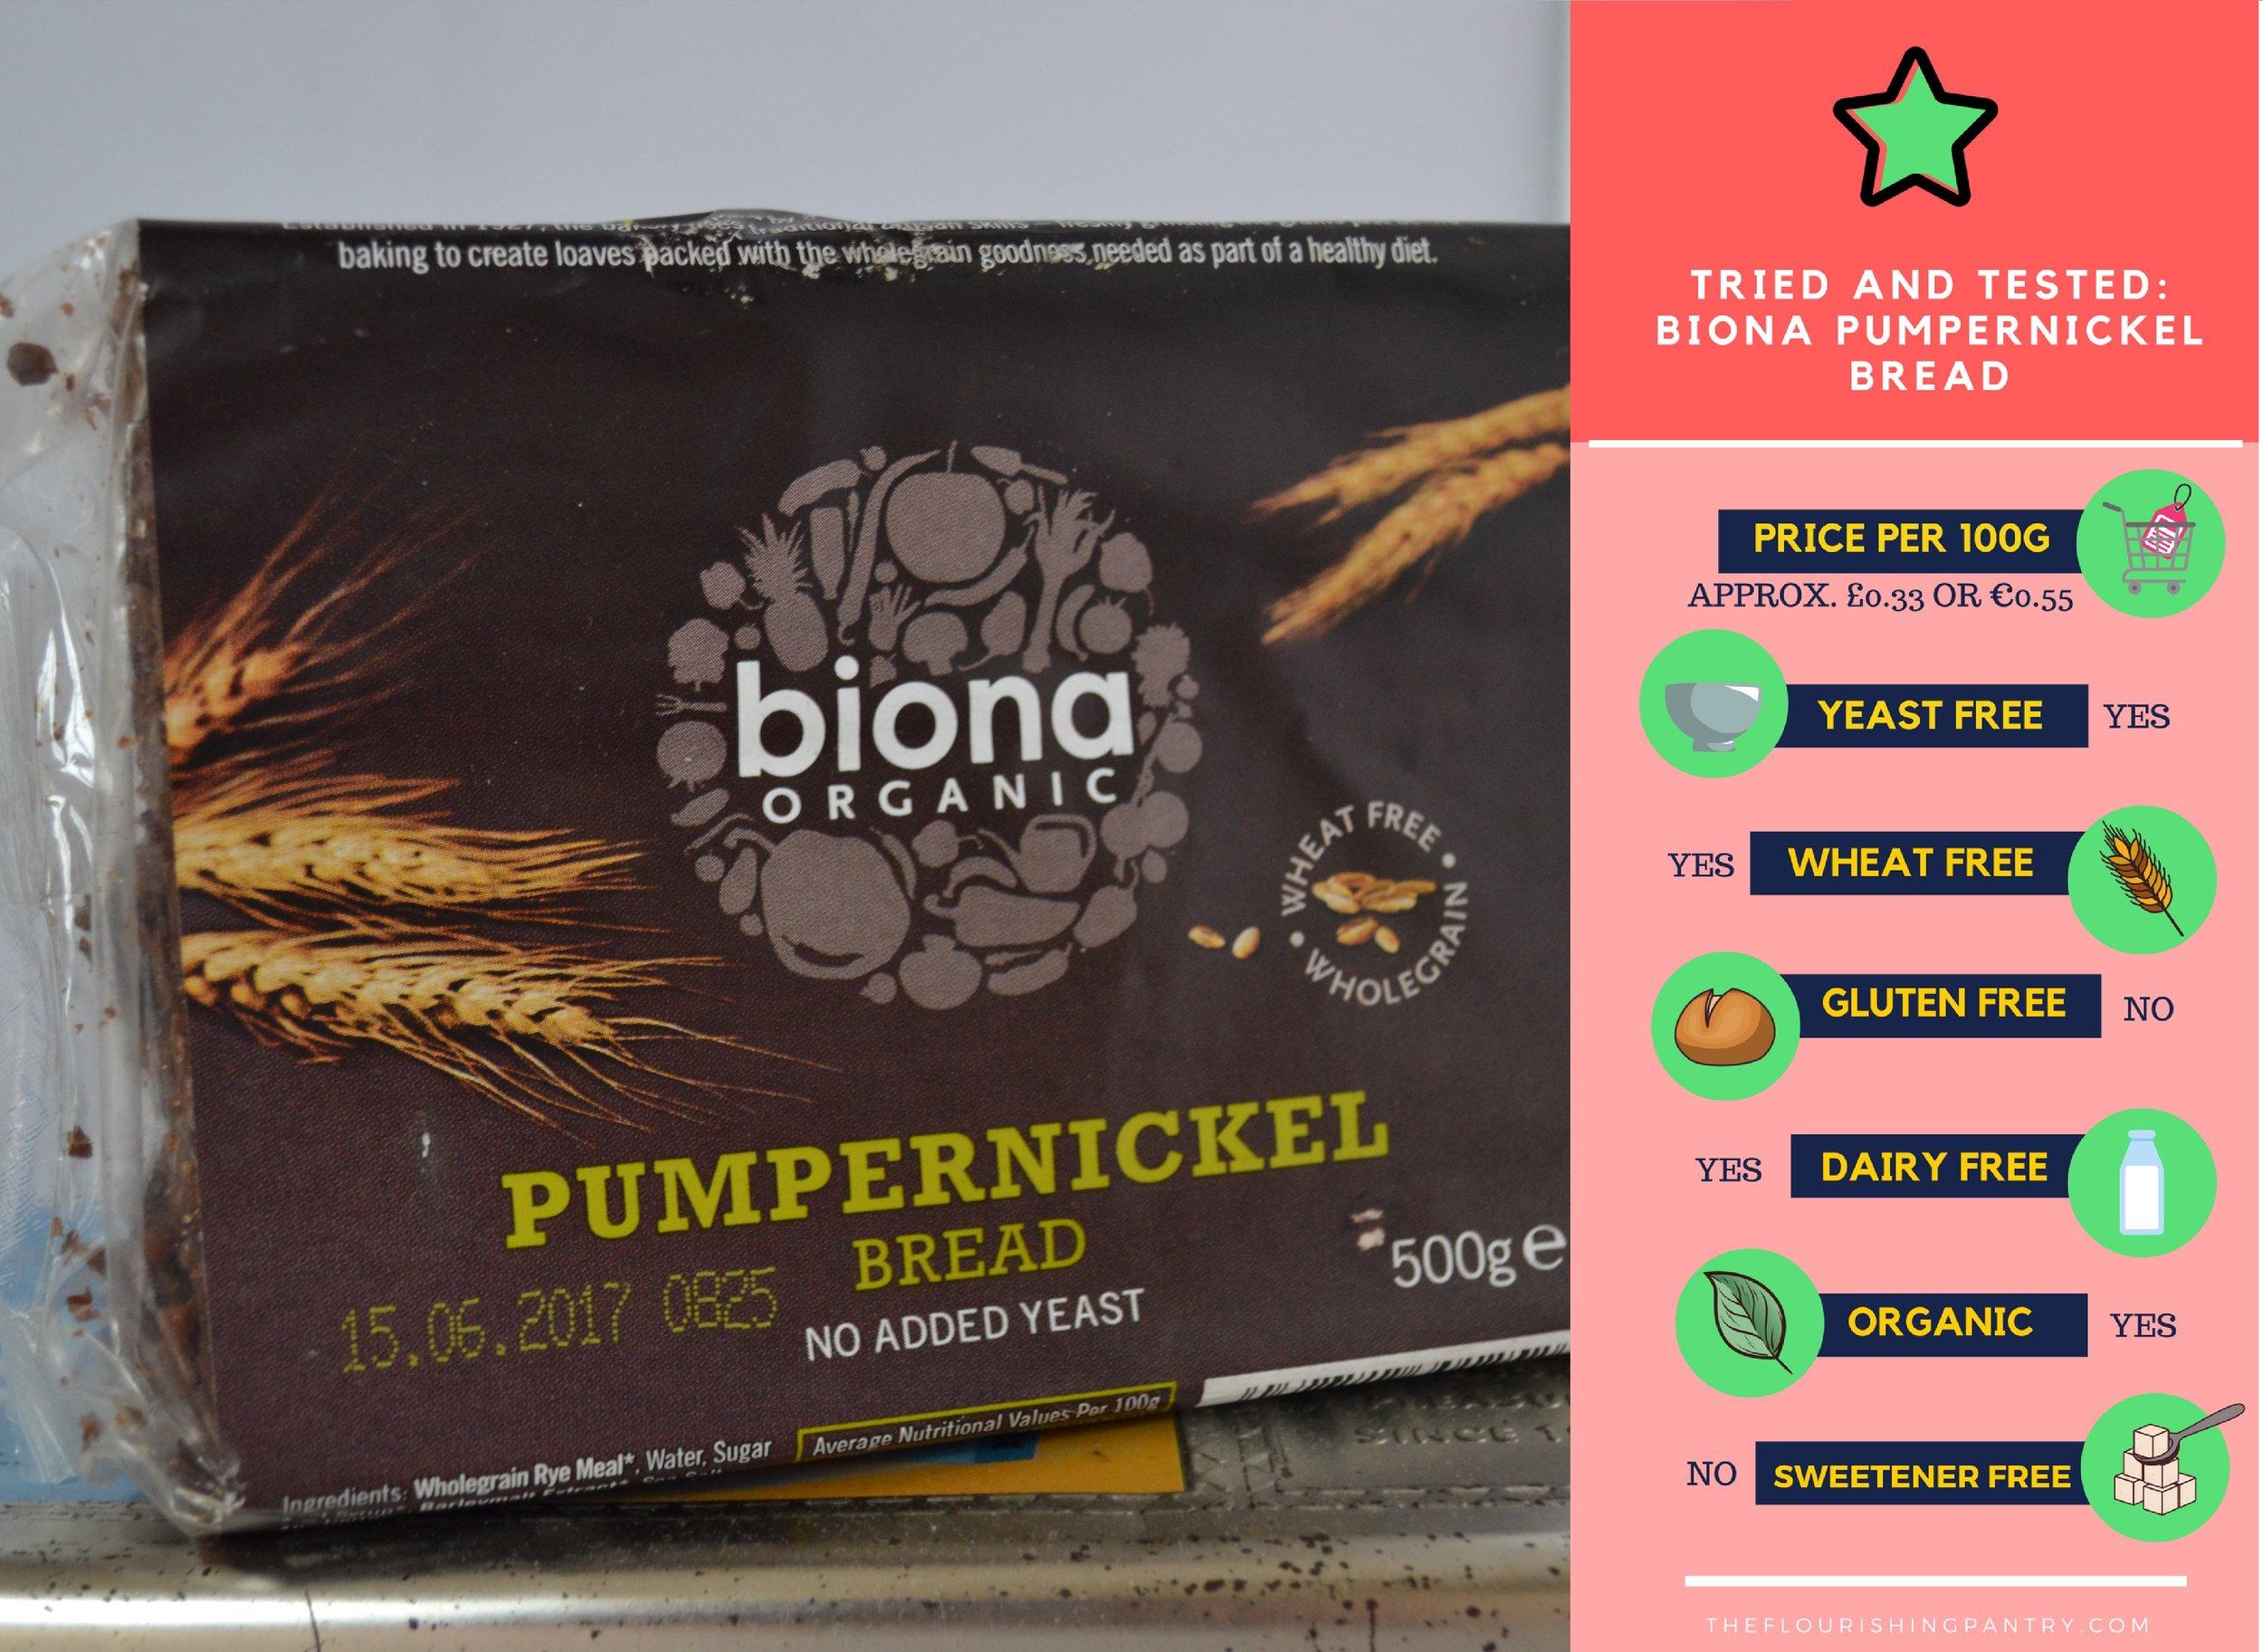 Biona Pumpernickel bread review | The Flourishing Pantry | yeast free diet blog